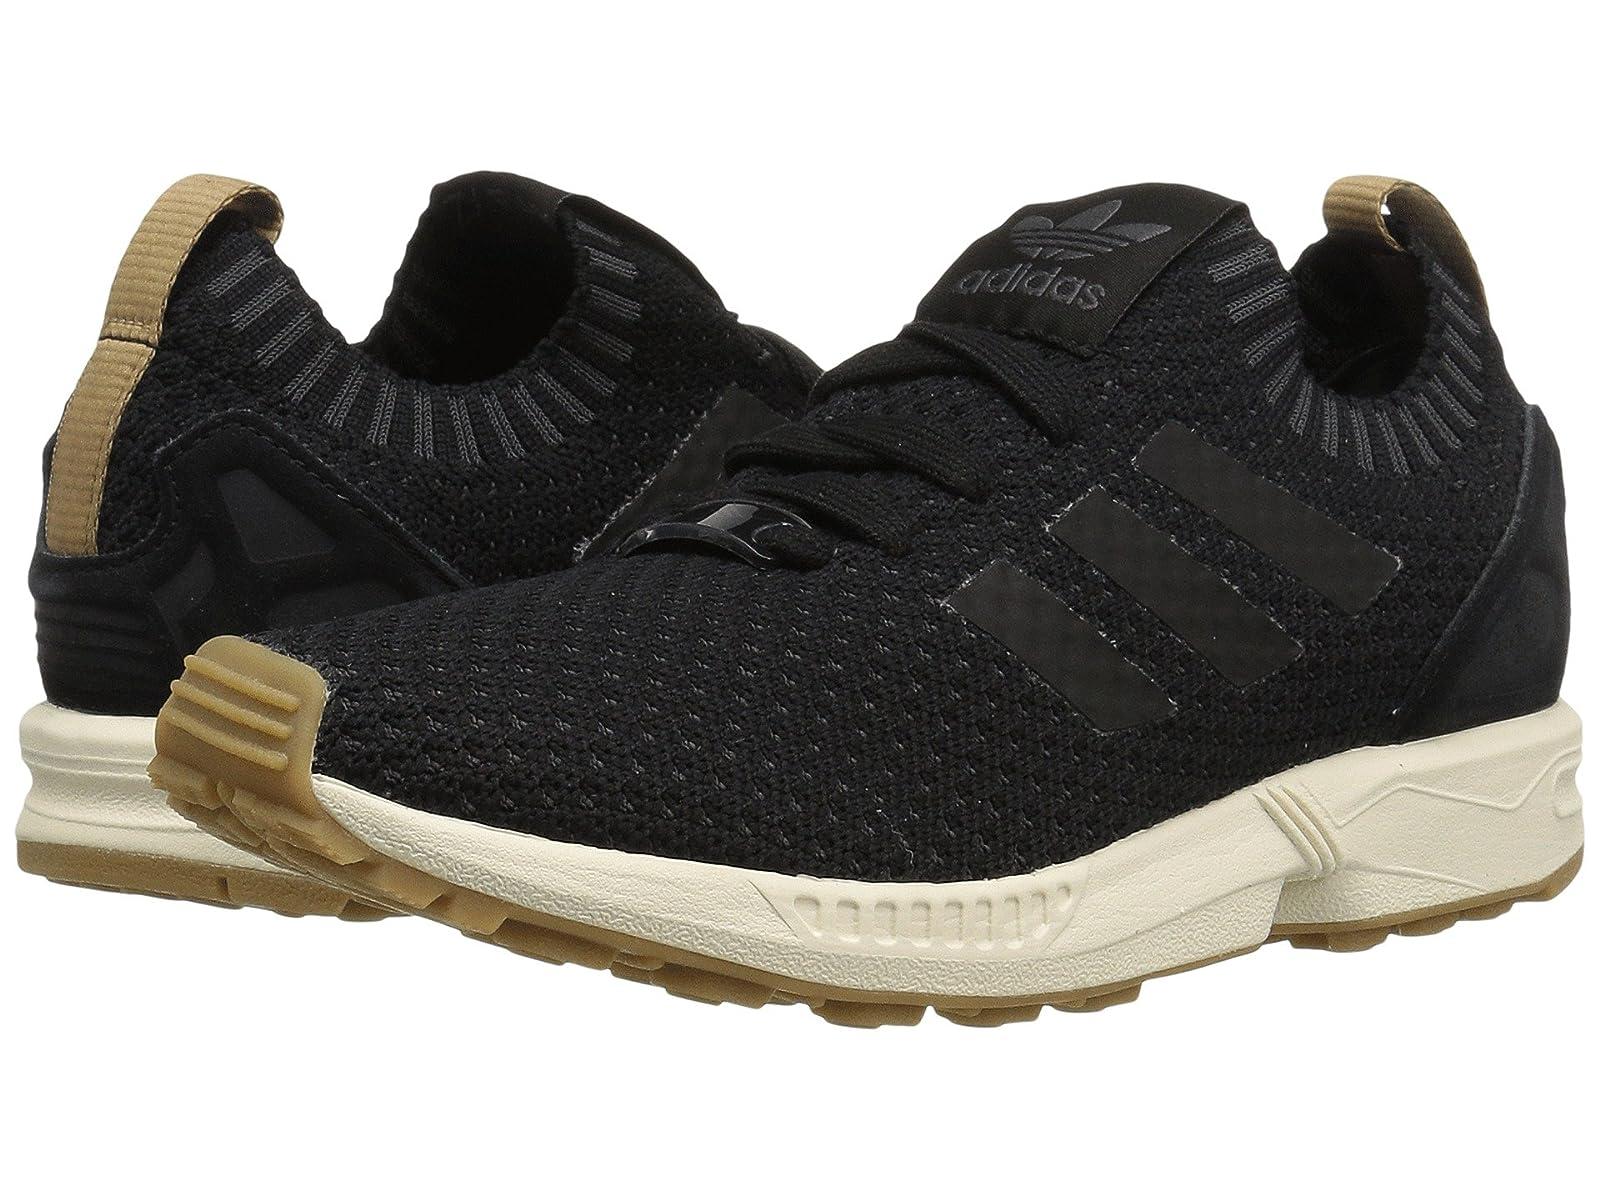 adidas Originals ZX Flux PrimeknitAtmospheric grades have affordable shoes